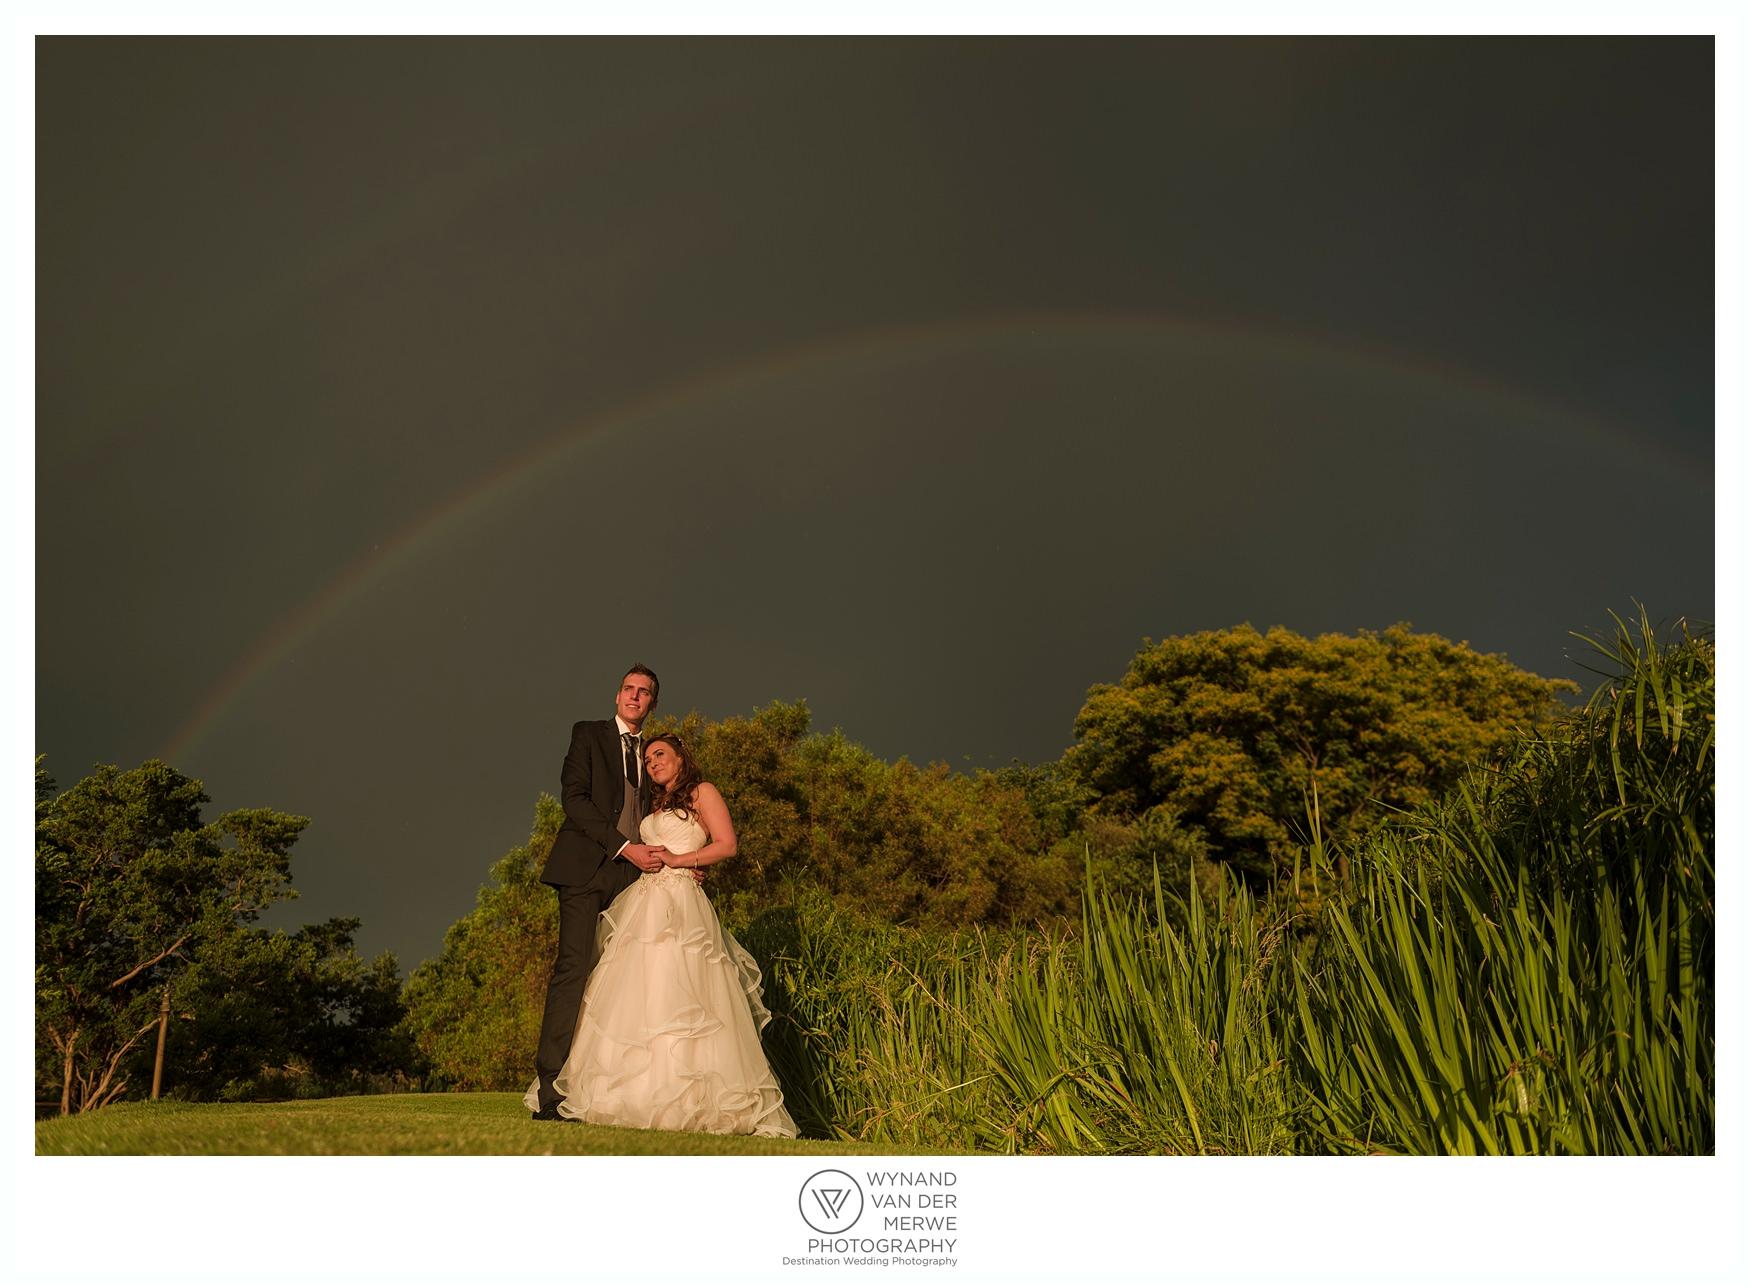 Wynandvandermerwe ryan natalia wedding photography cradle valley guesthouse gauteng-25.jpg